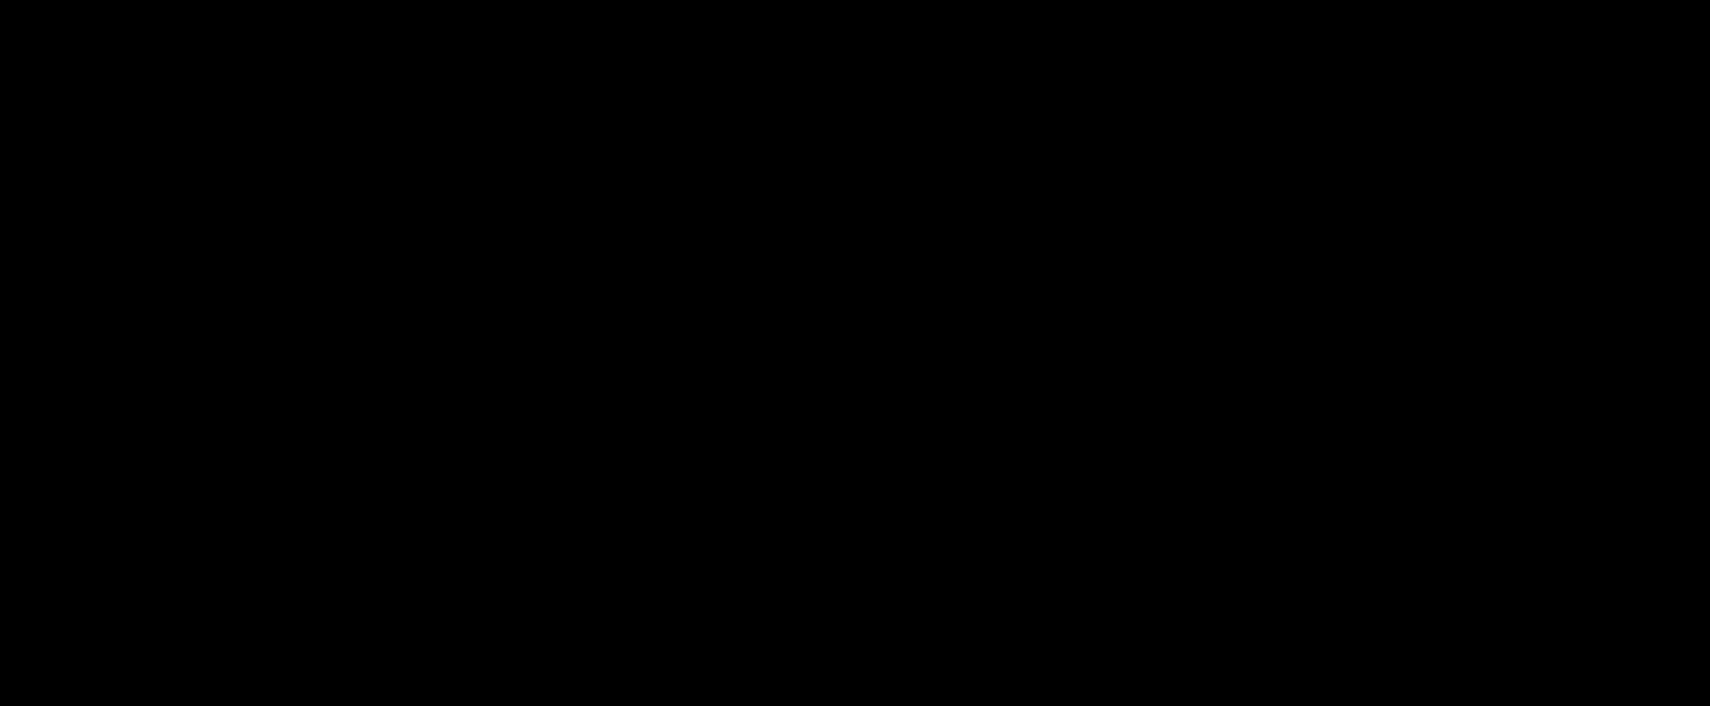 6-Acetoxynaphthalen-2-ylboronic acid pinacol ester